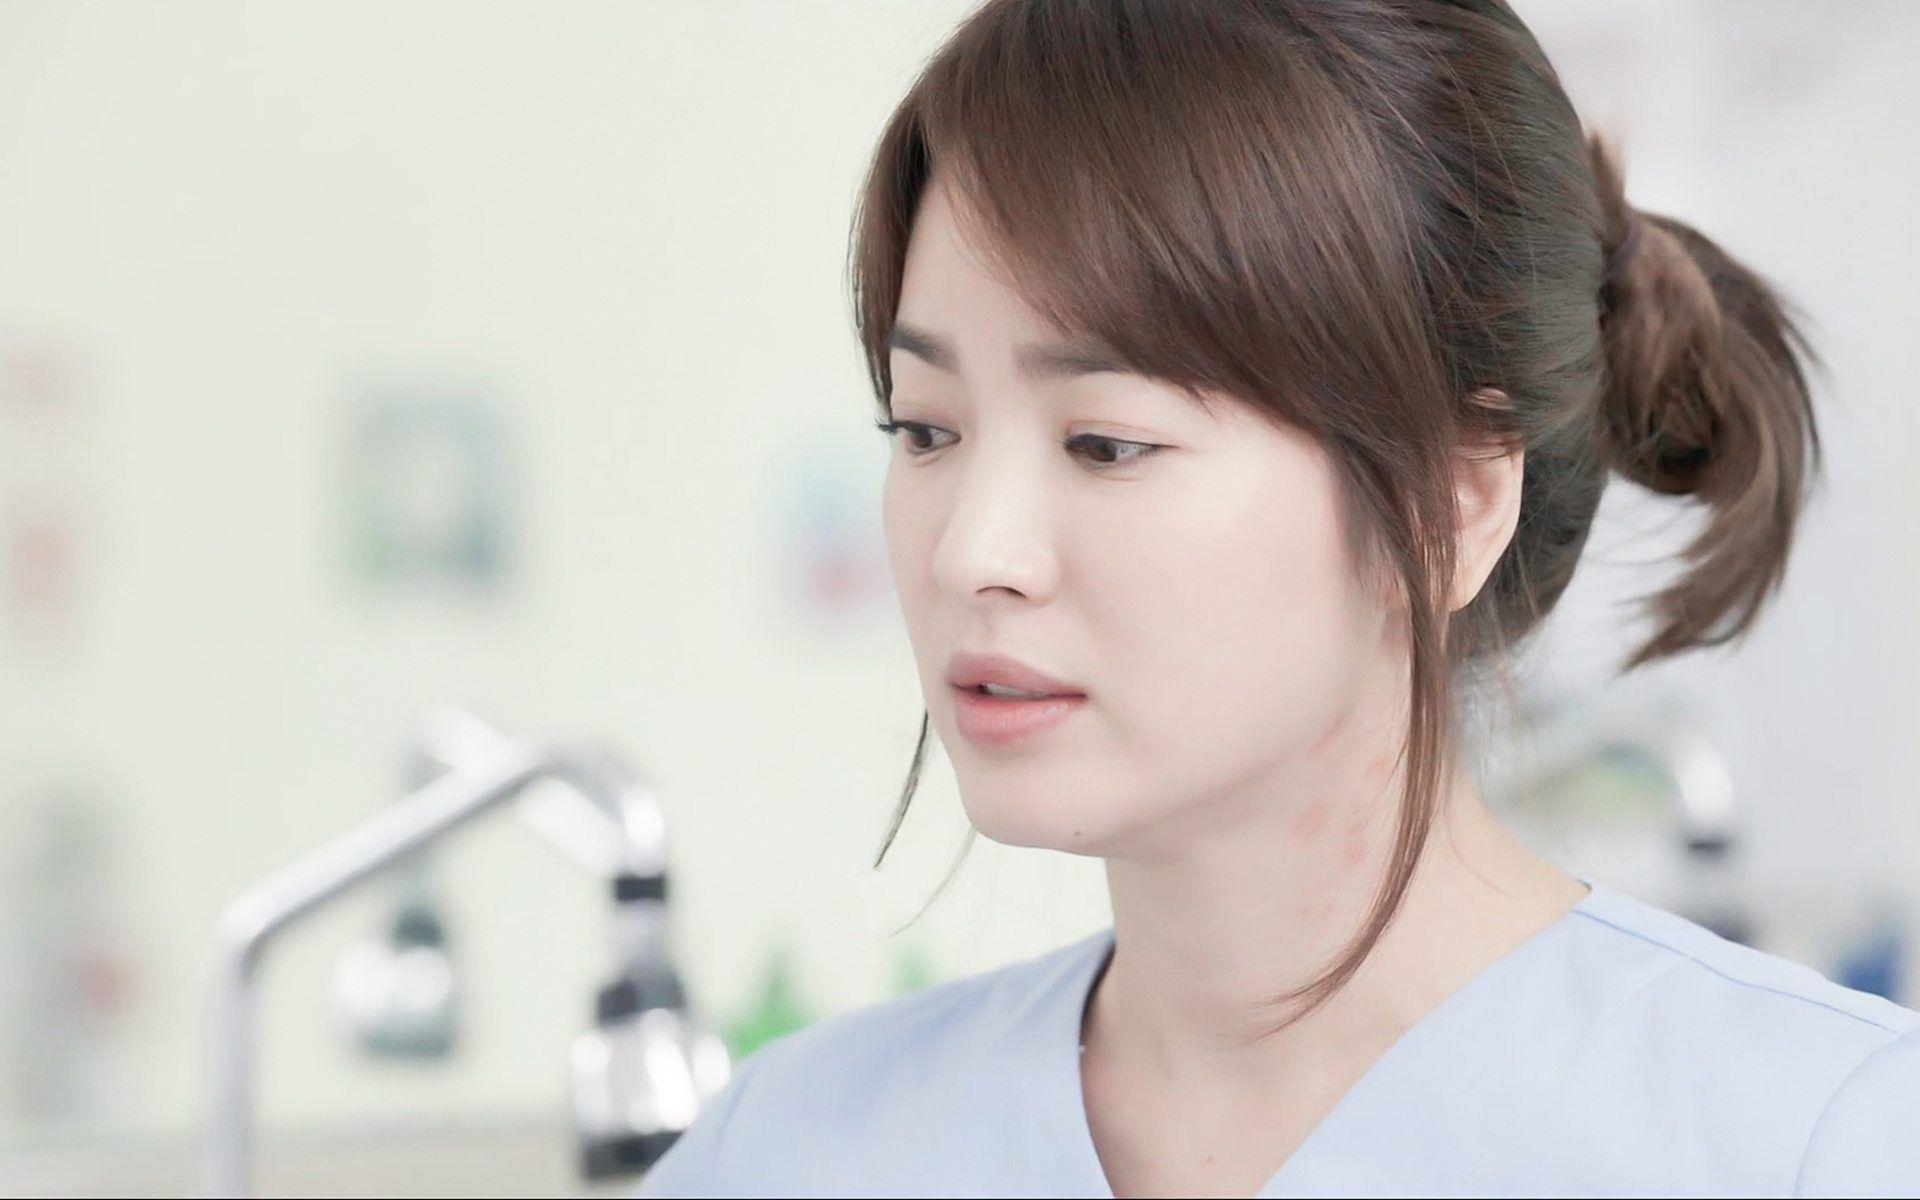 dan mang xon xao khi chi dau song joong ki lai giong song hye kyo den kho tin - 4